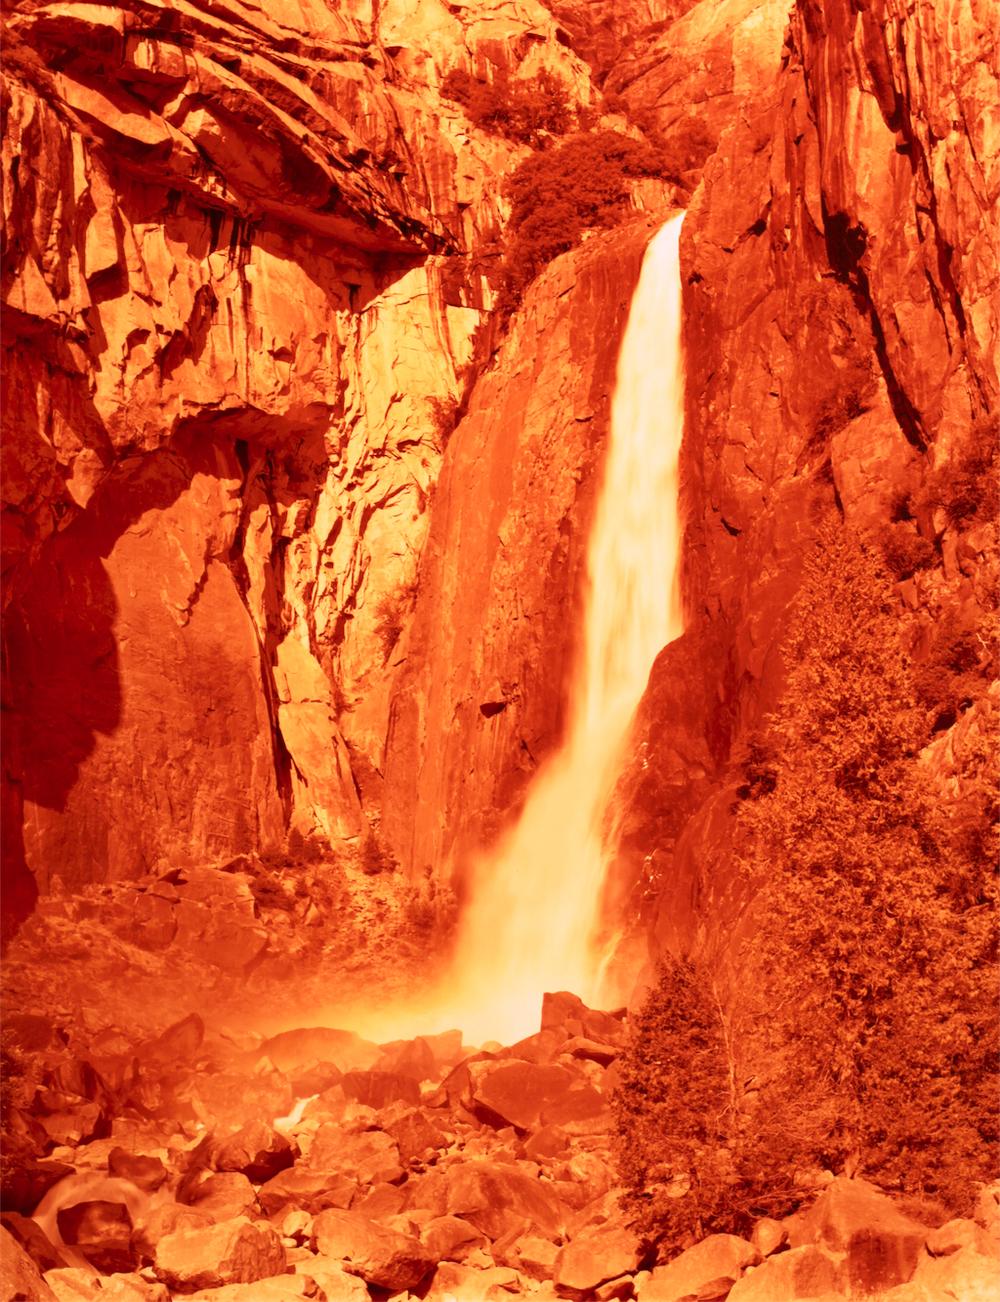 David Benjamin Sherry, Lower Yosemite Falls, Yosemite, California